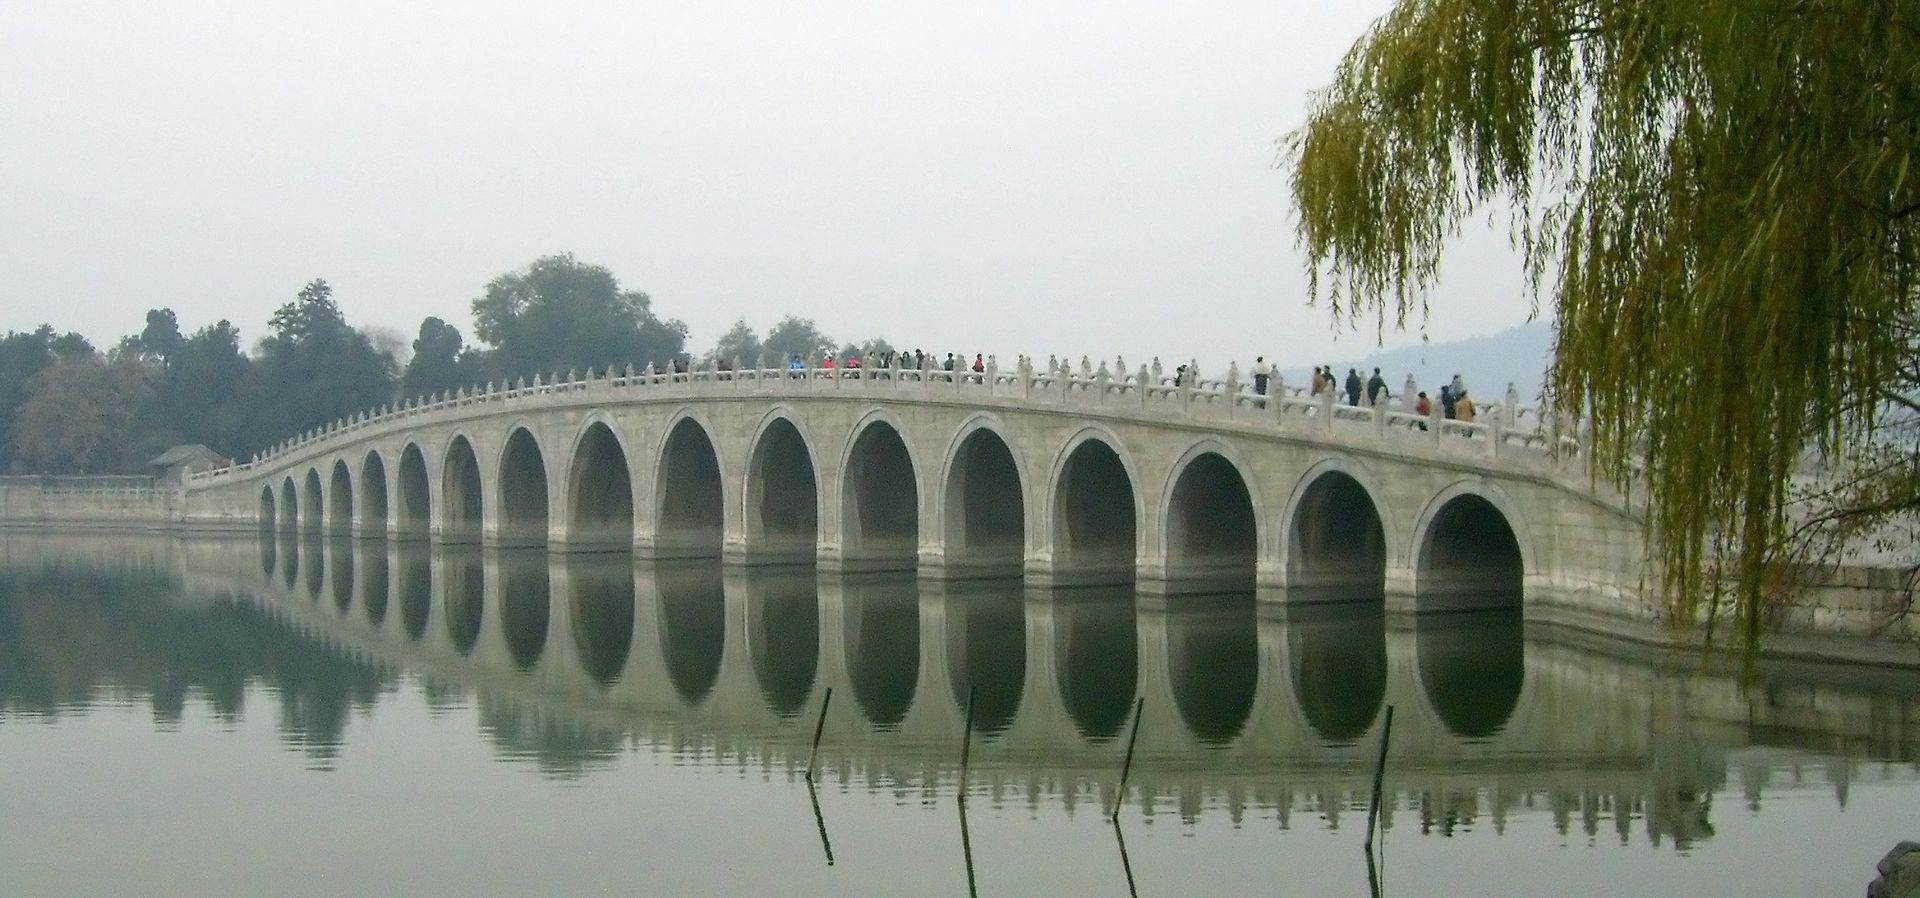 https://upload.wikimedia.org/wikipedia/commons/thumb/8/8a/17_bridge.JPG/1920px-17_bridge.JPG